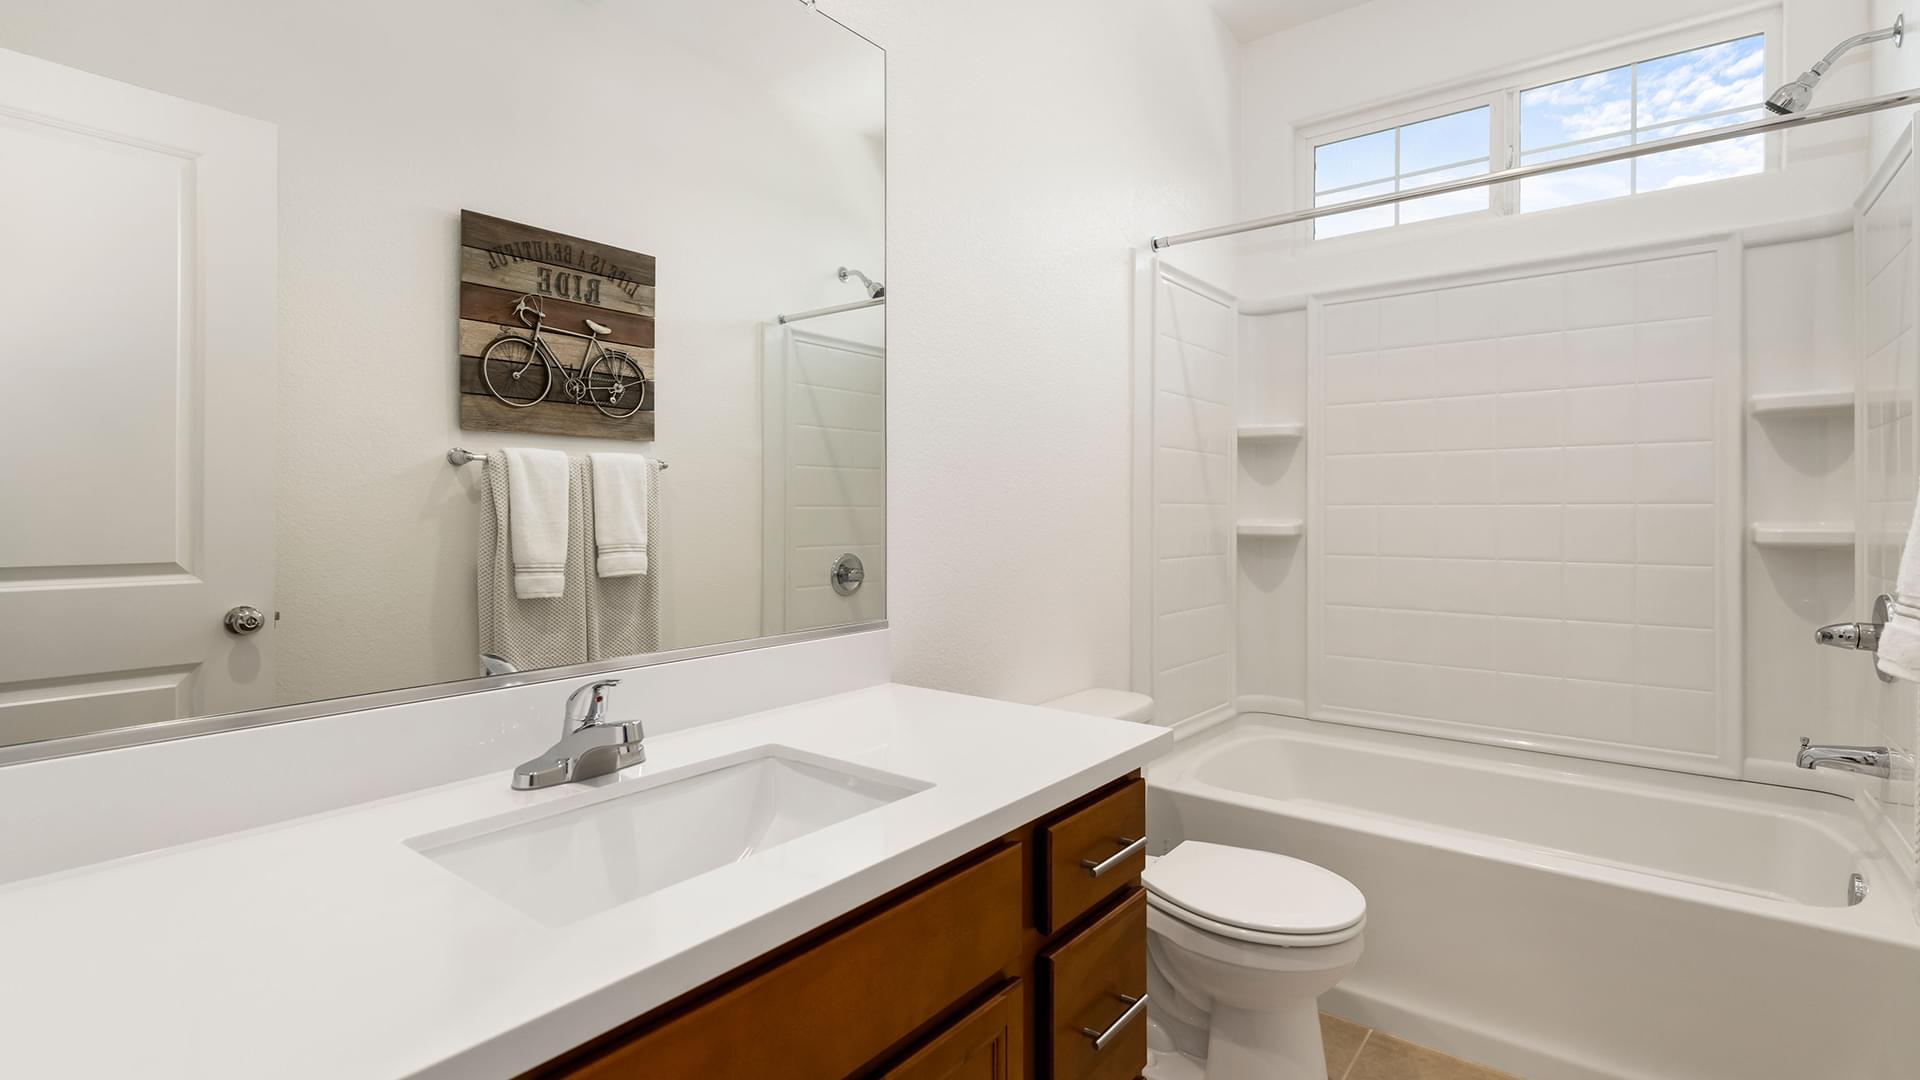 Residence 2A | Lot 167 | Bath 2